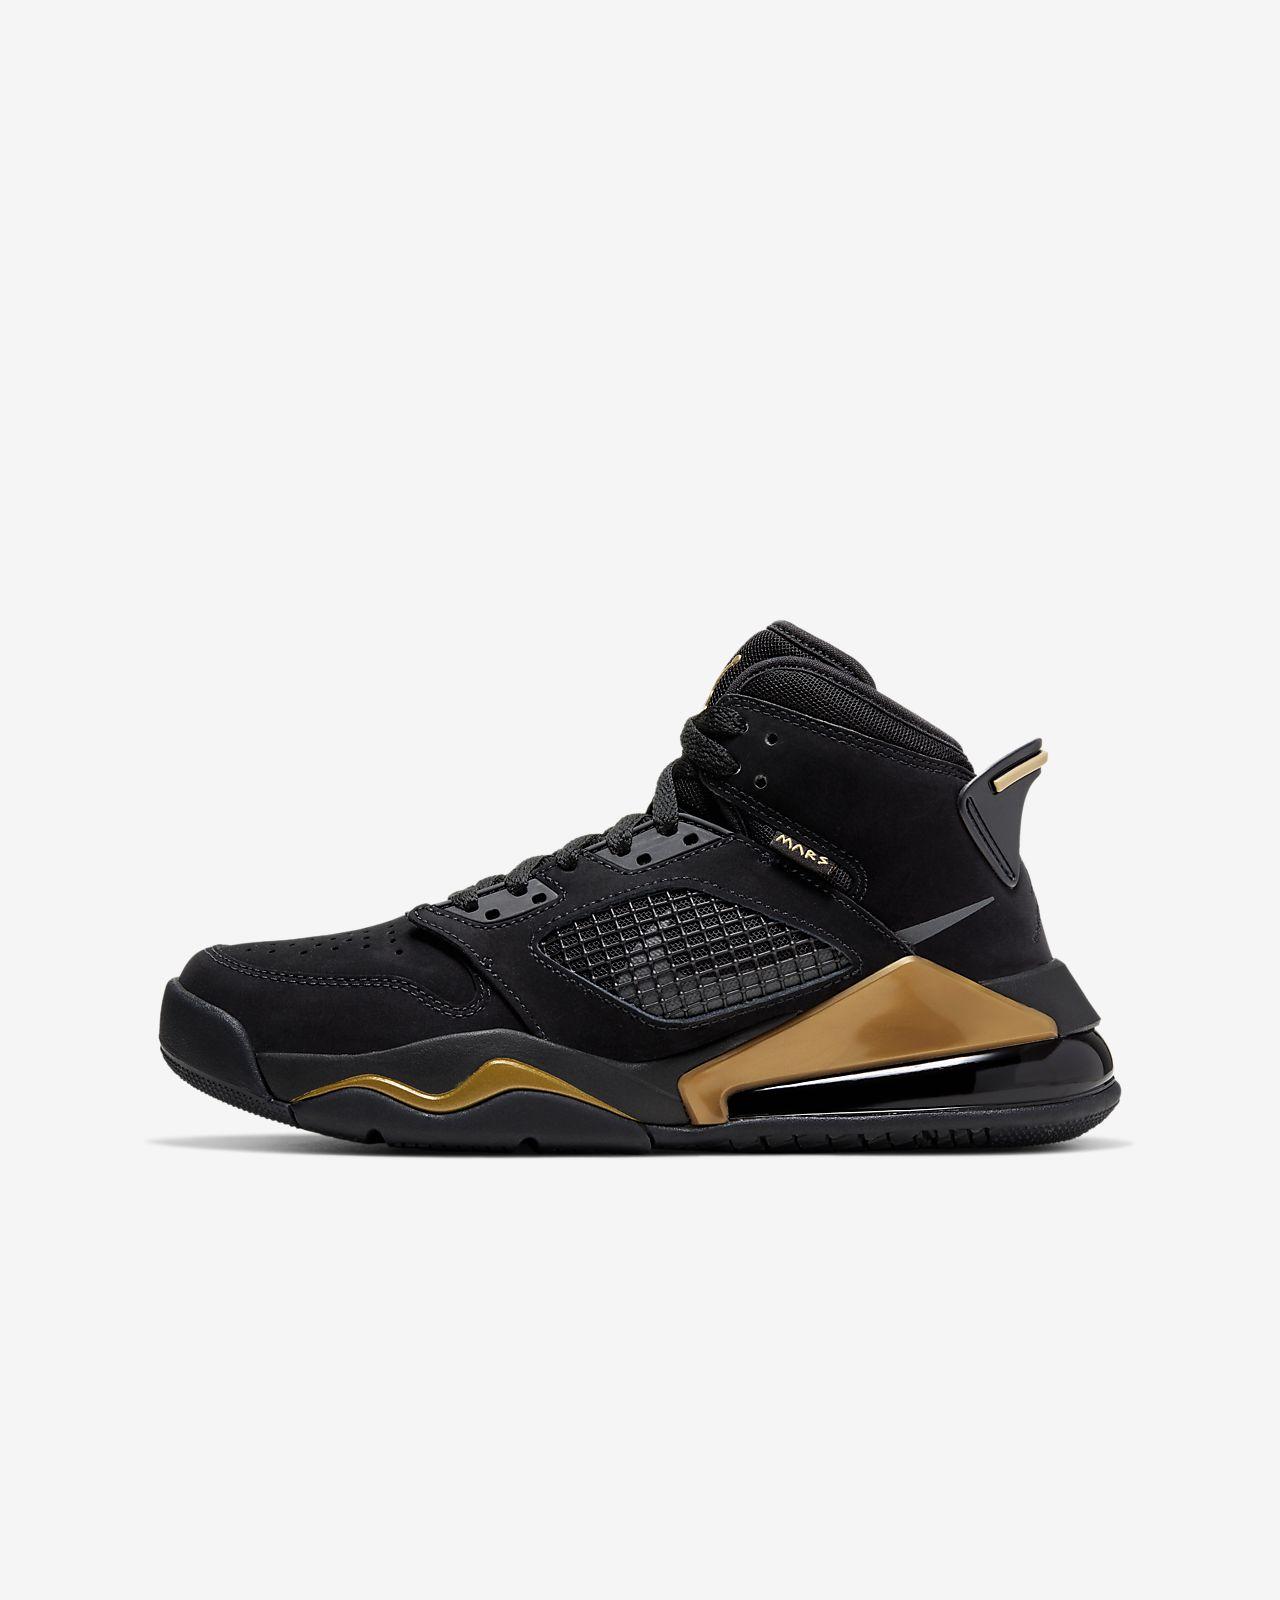 Jordan Mars 270 Older Kids' Shoe